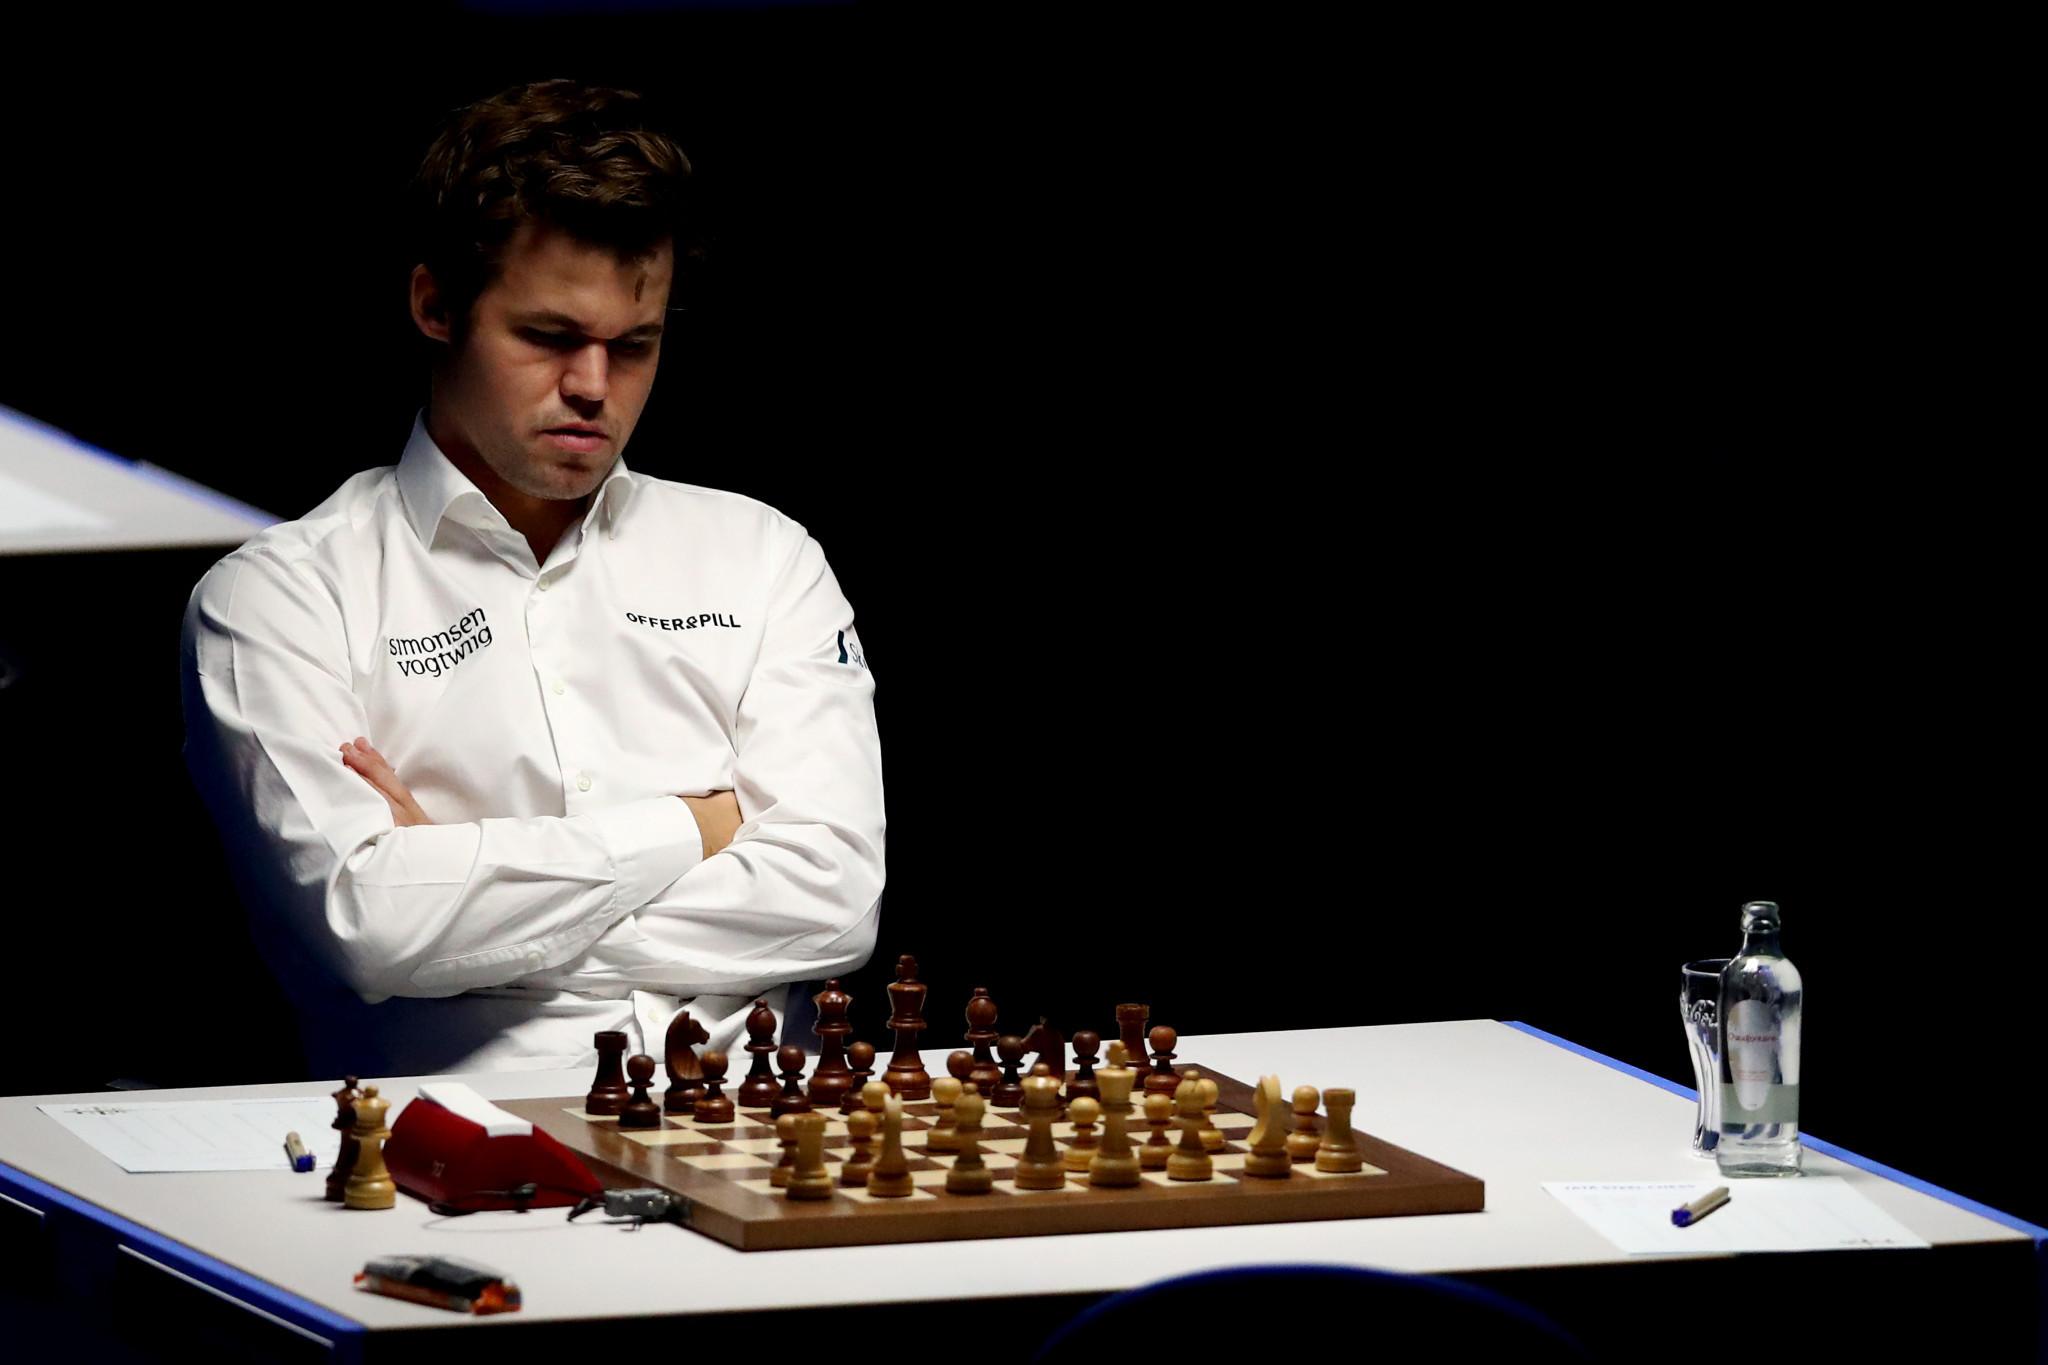 Postponed World Chess Championship rearranged for Expo 2020 Dubai